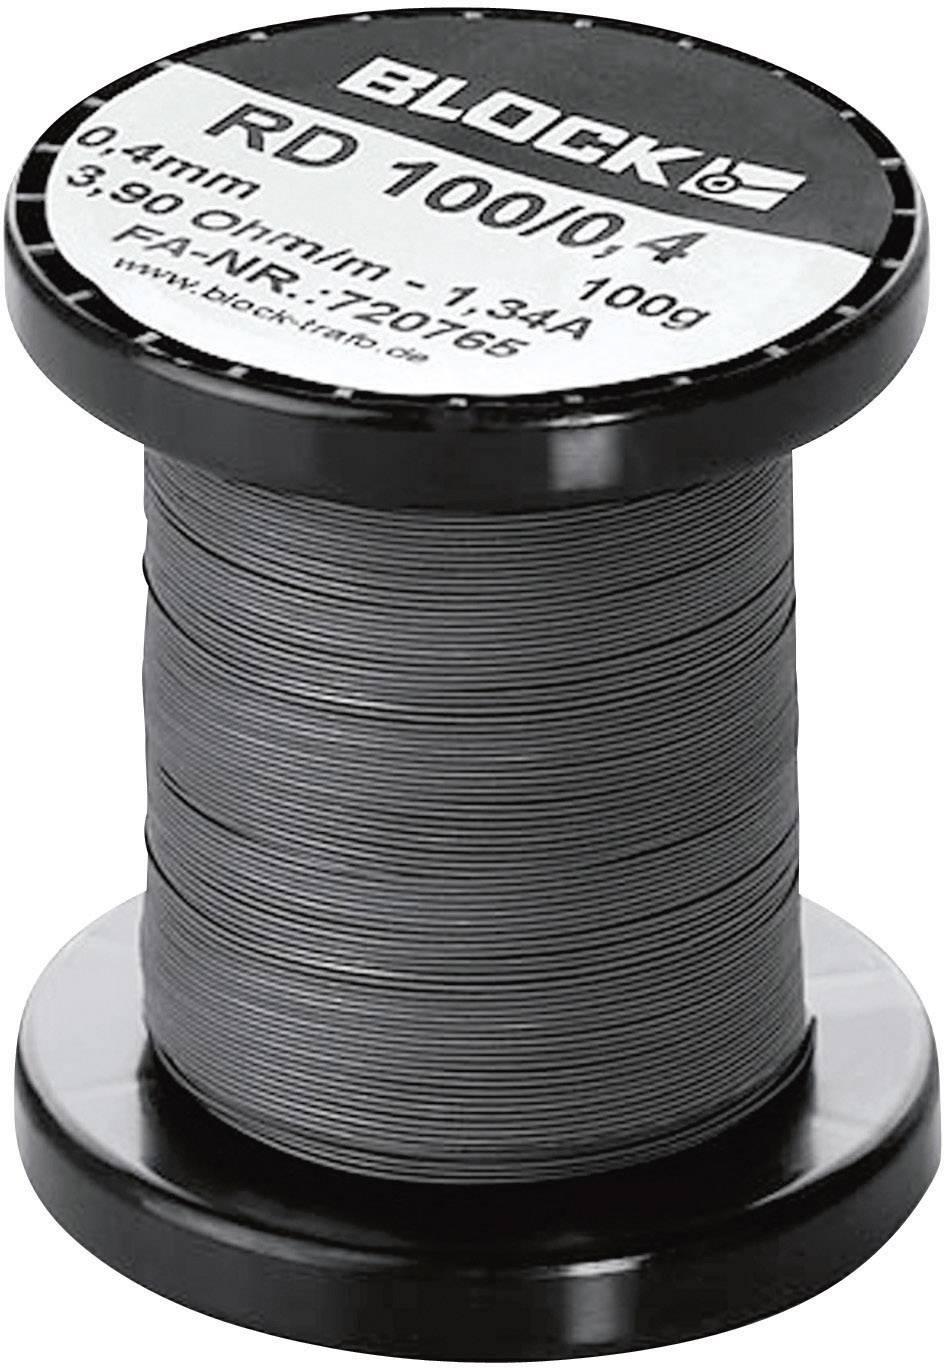 Odporový drát (konstantan) Block RD 100/0,3, 6.93 Ω/m, 158 m